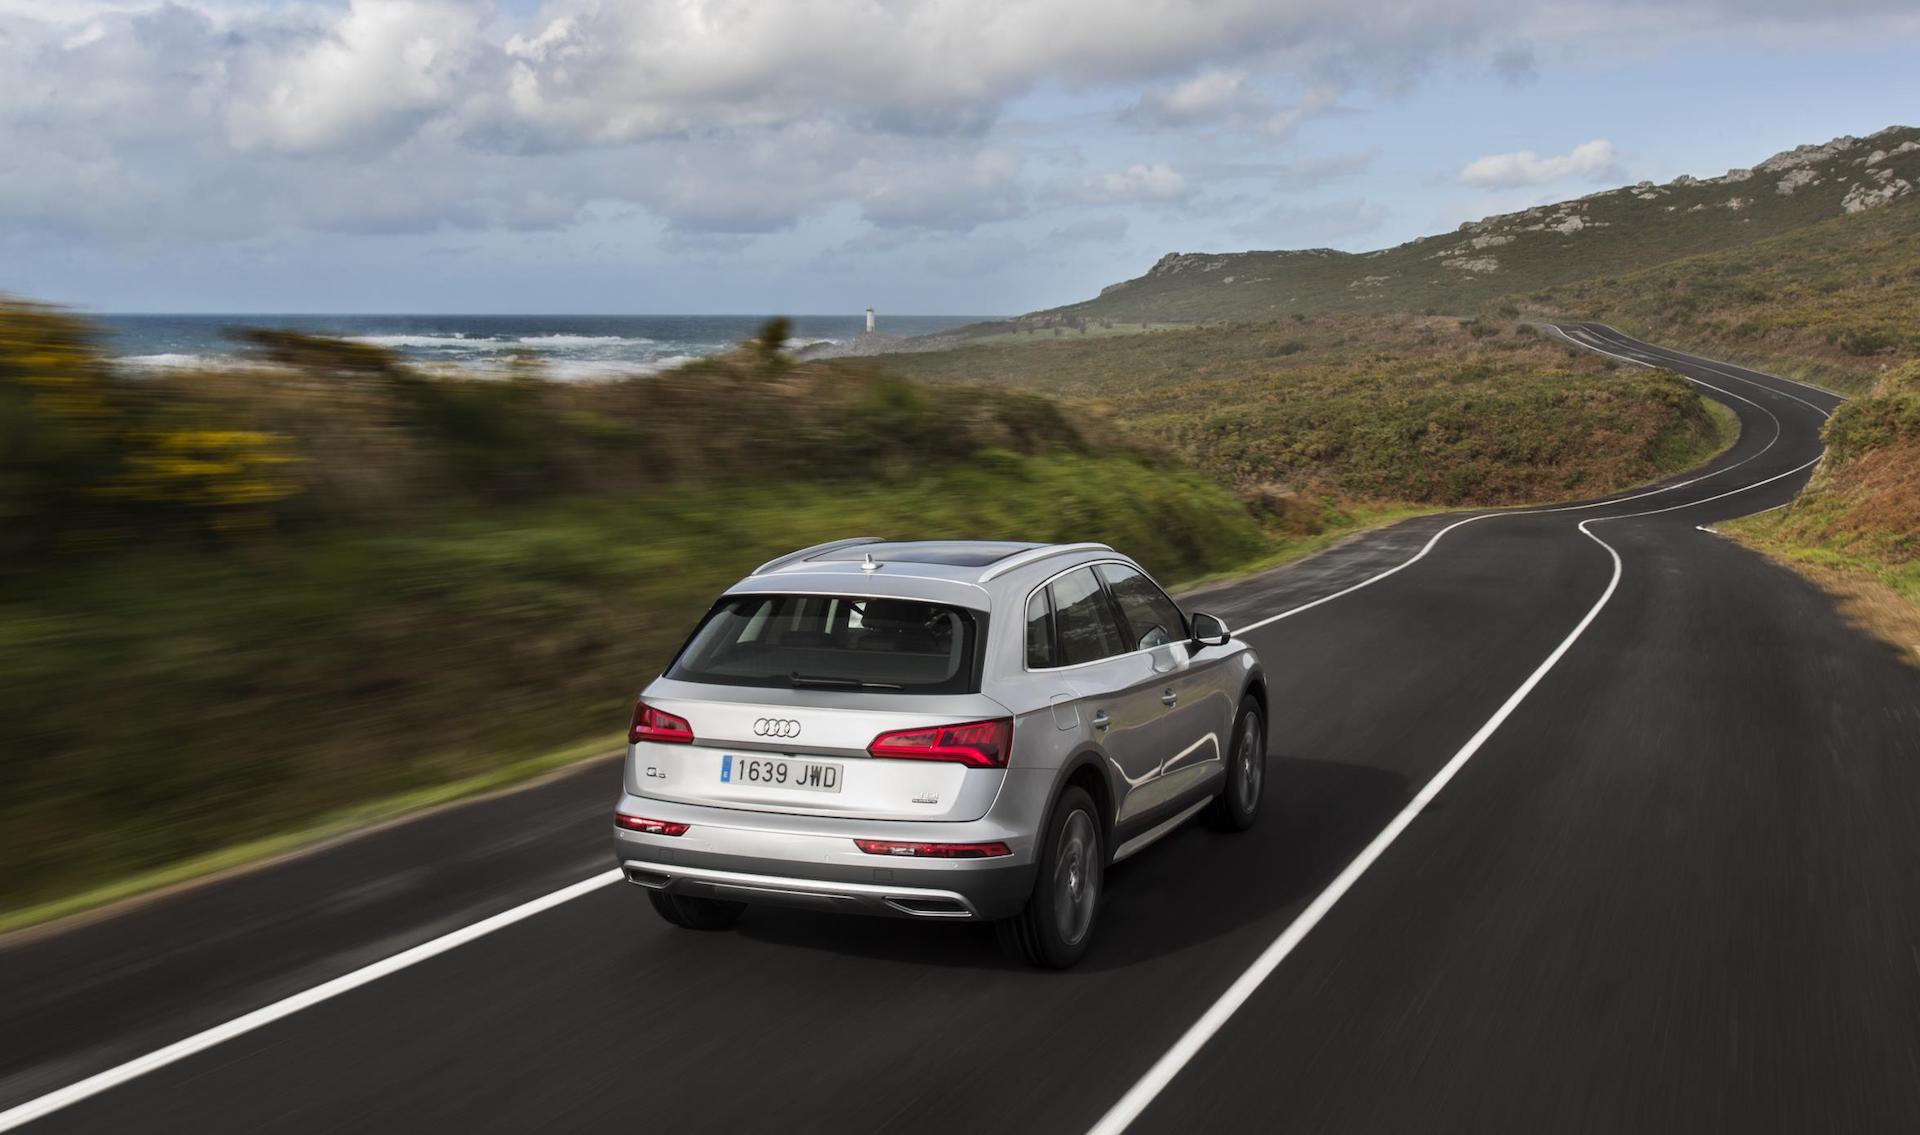 Audi Q5 Tdi Mild Hybrid 3